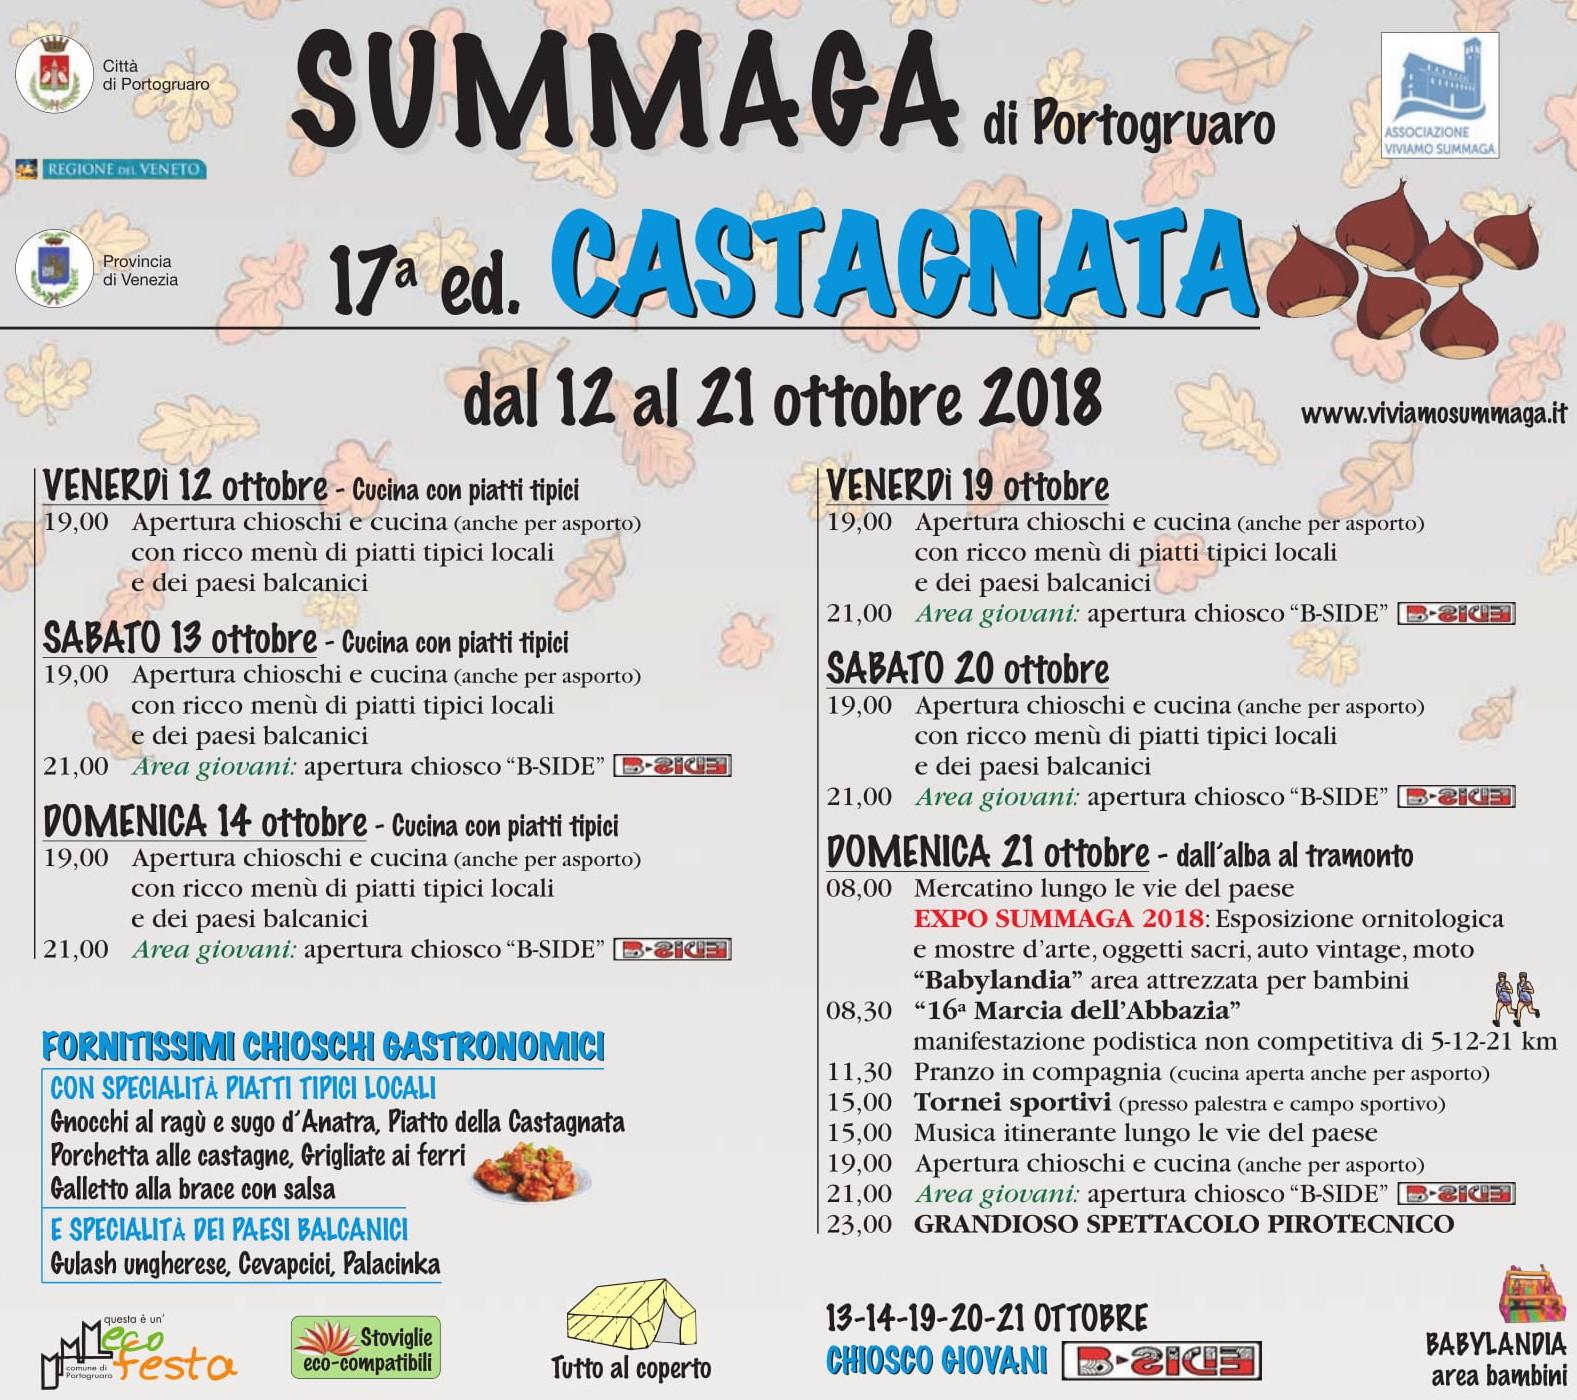 Programma Castagnata 2018